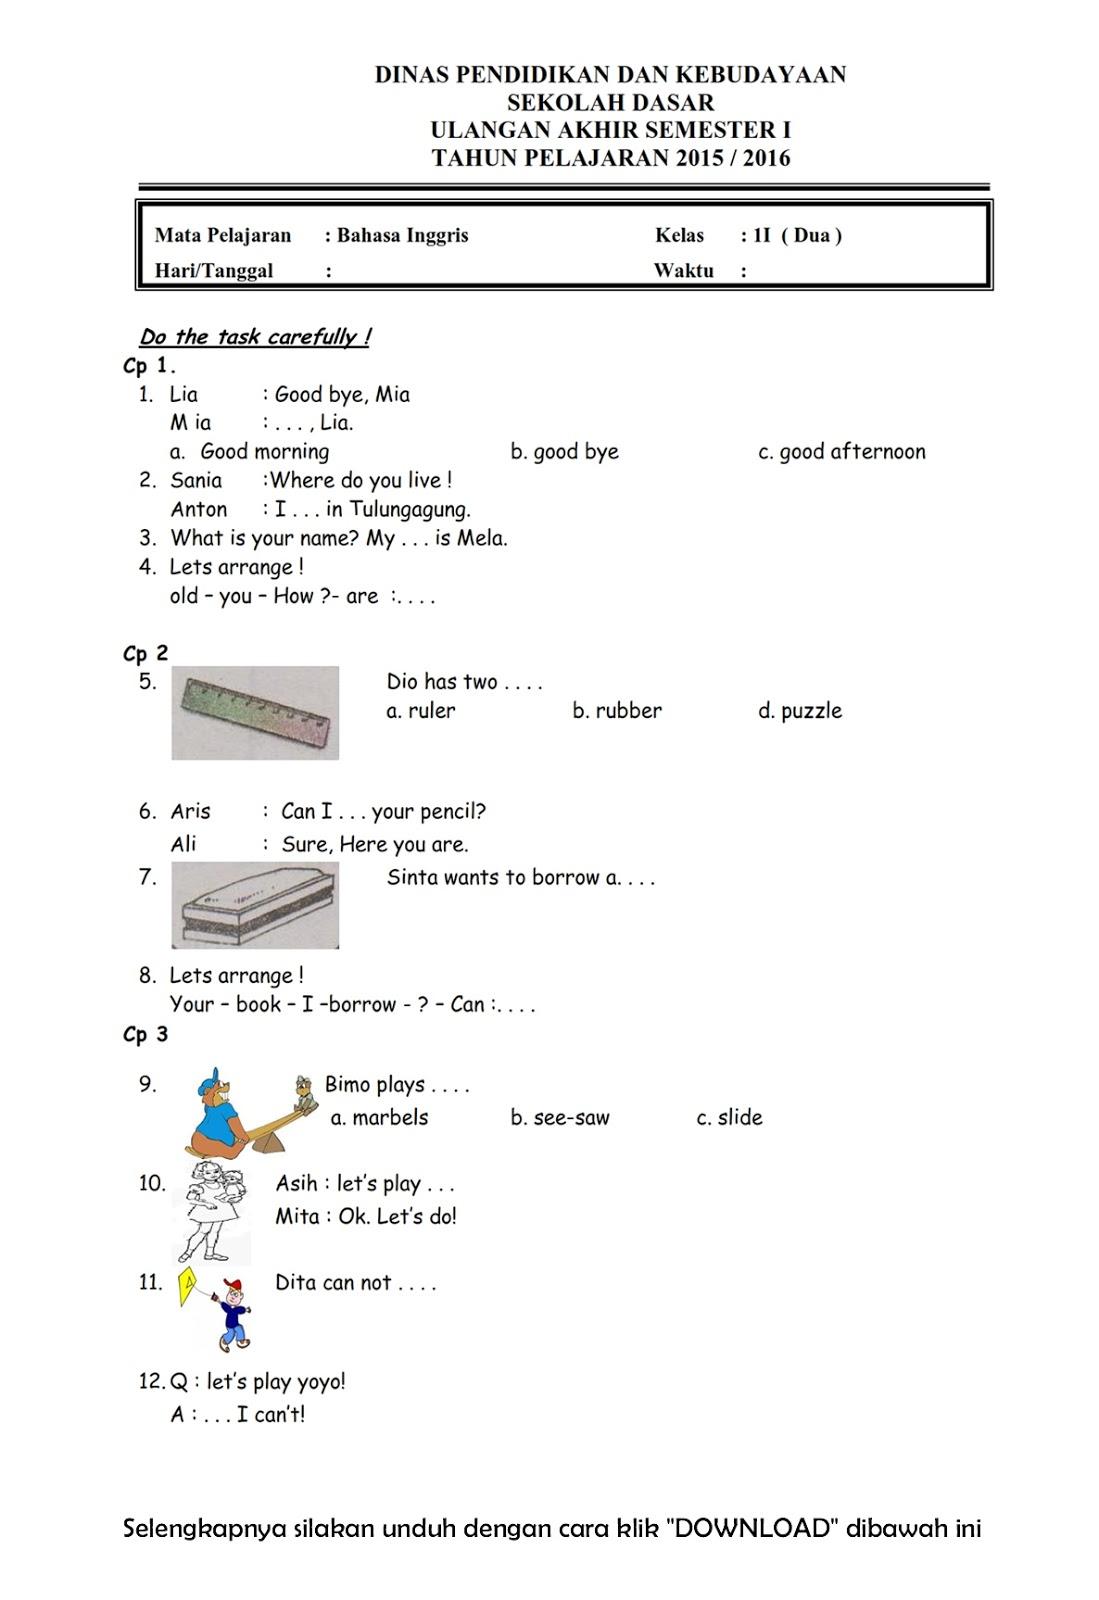 Materi B Inggris Sd Kls 6 Silabus Bahasa Inggris Kelas 1 6 Sd Scribd Download Soal Uas Bahasa Inggris Kelas 2 Semester 1 20152016 Rief